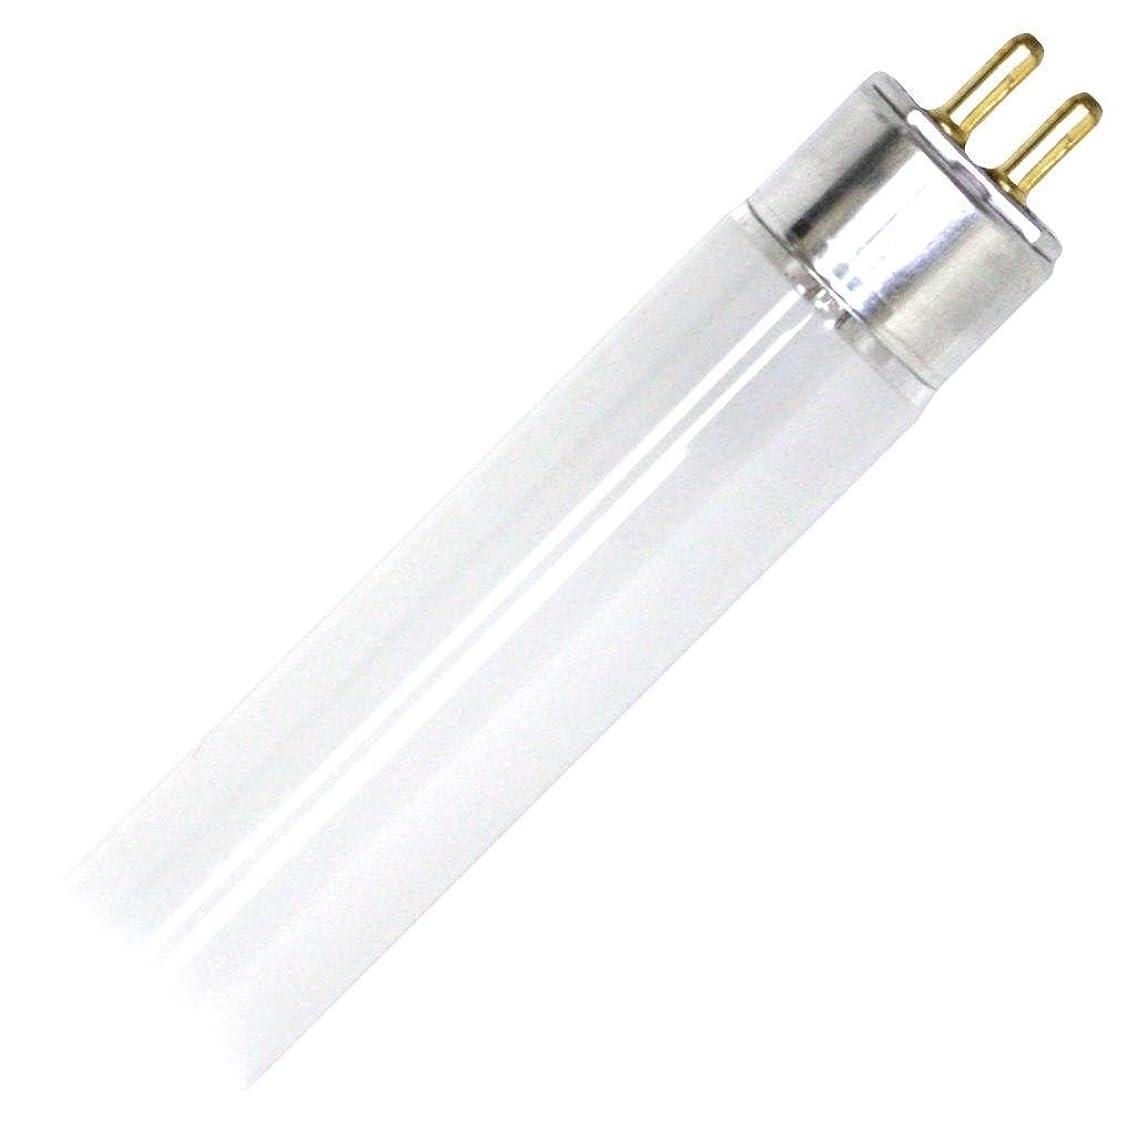 GE 90063 - F8T5/XL/CW Straight T5 Fluorescent Tube Light Bulb